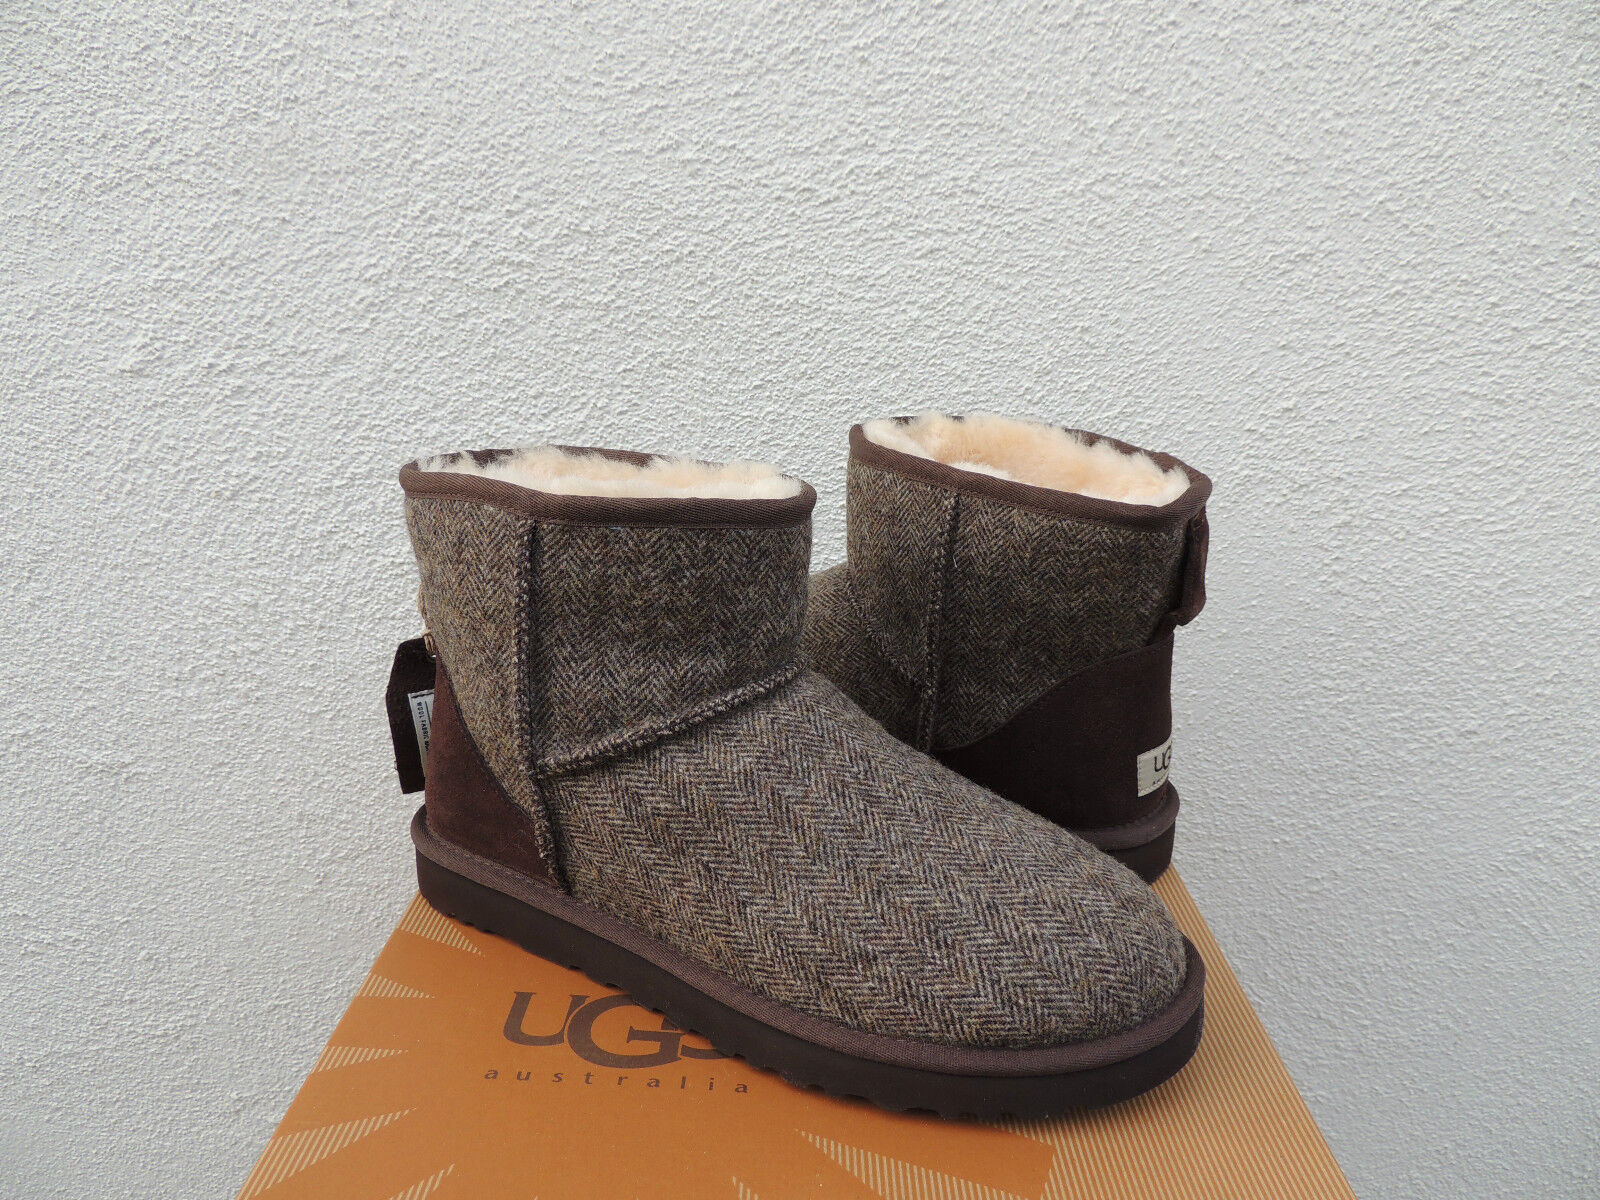 d74041b16 UGG Mens Classic Mini Patchwork Tweed Sheepwool BOOTS US 9/ EUR 42 ...